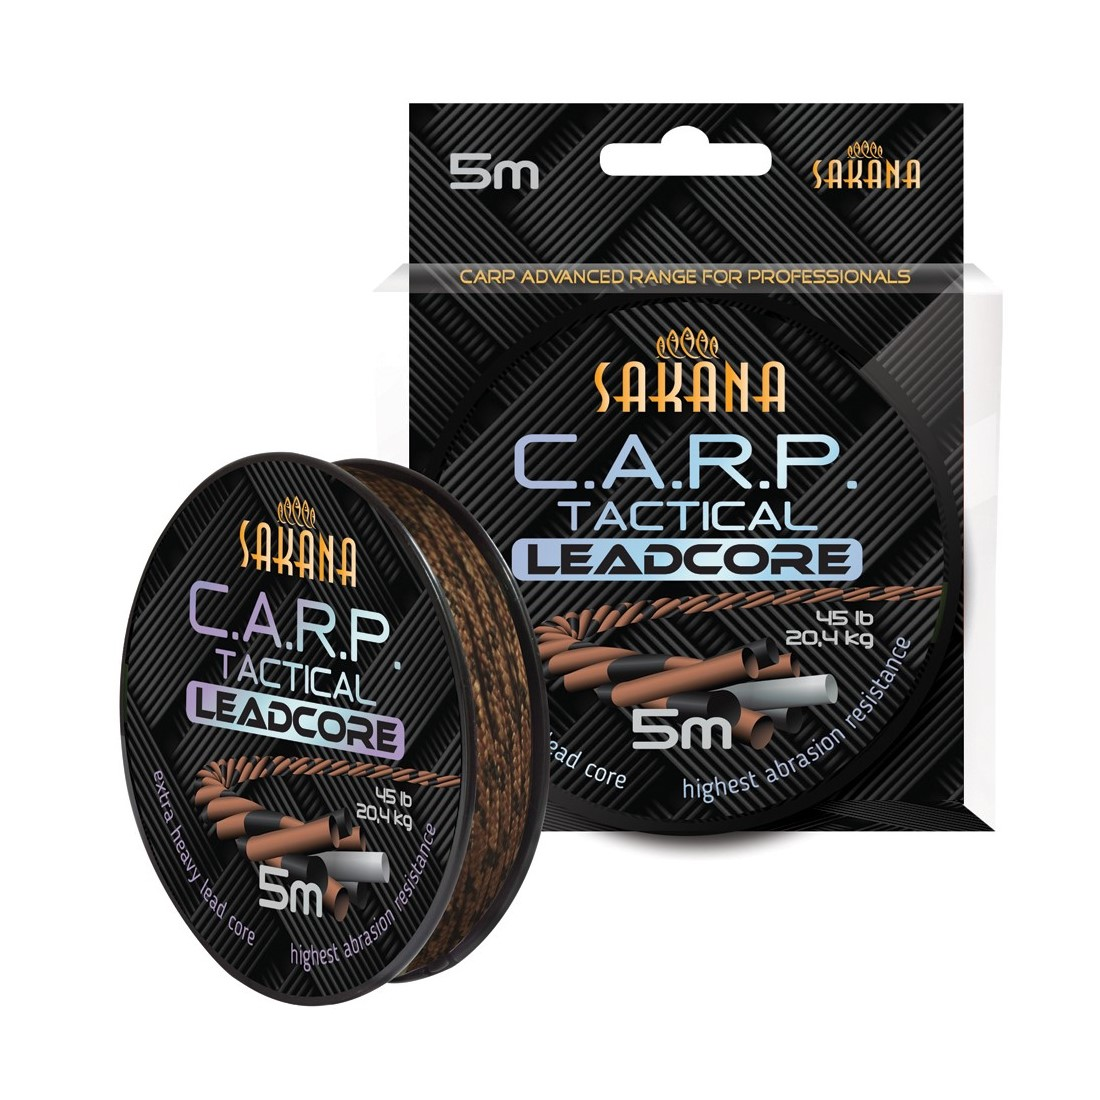 Лидкор Sakana CARP Tactical Leadcore Brown 5m